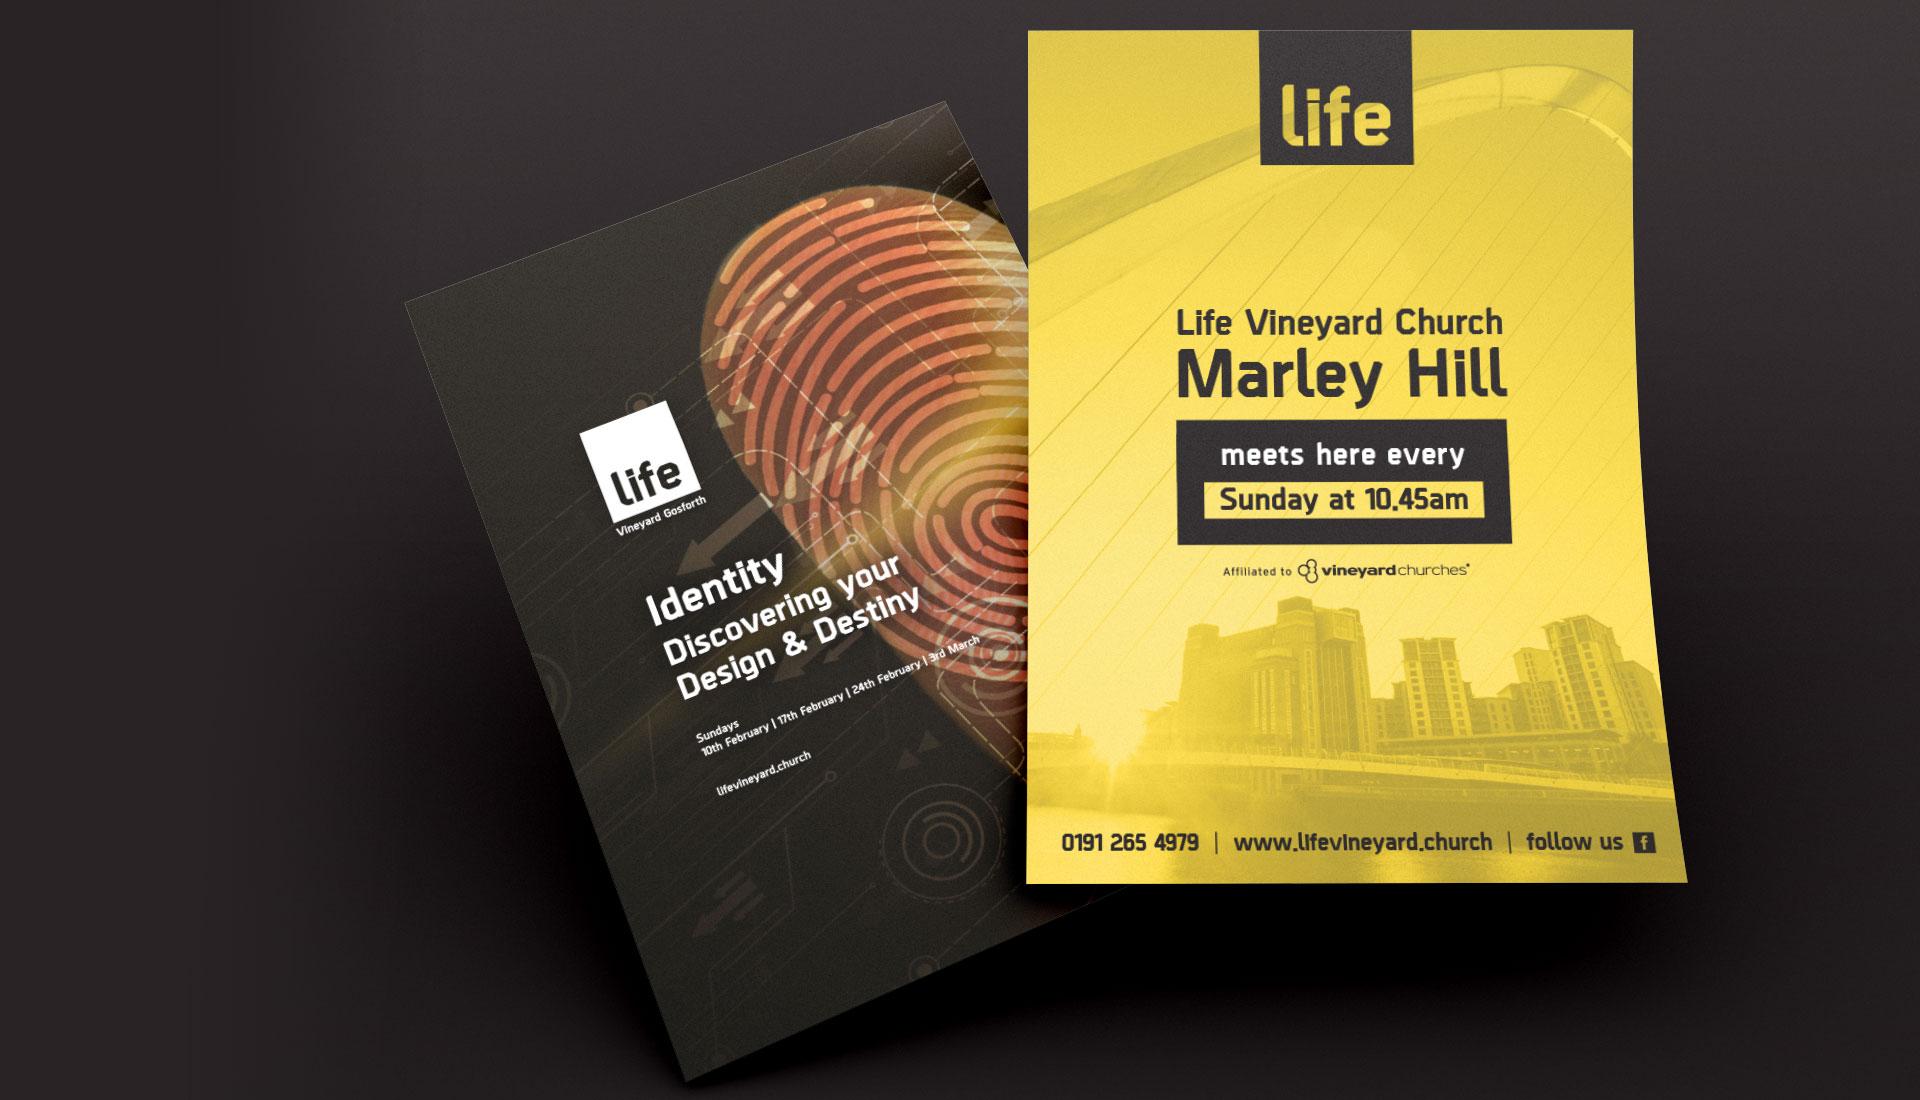 Life Vineyard Church leaflets designed by Sleeky